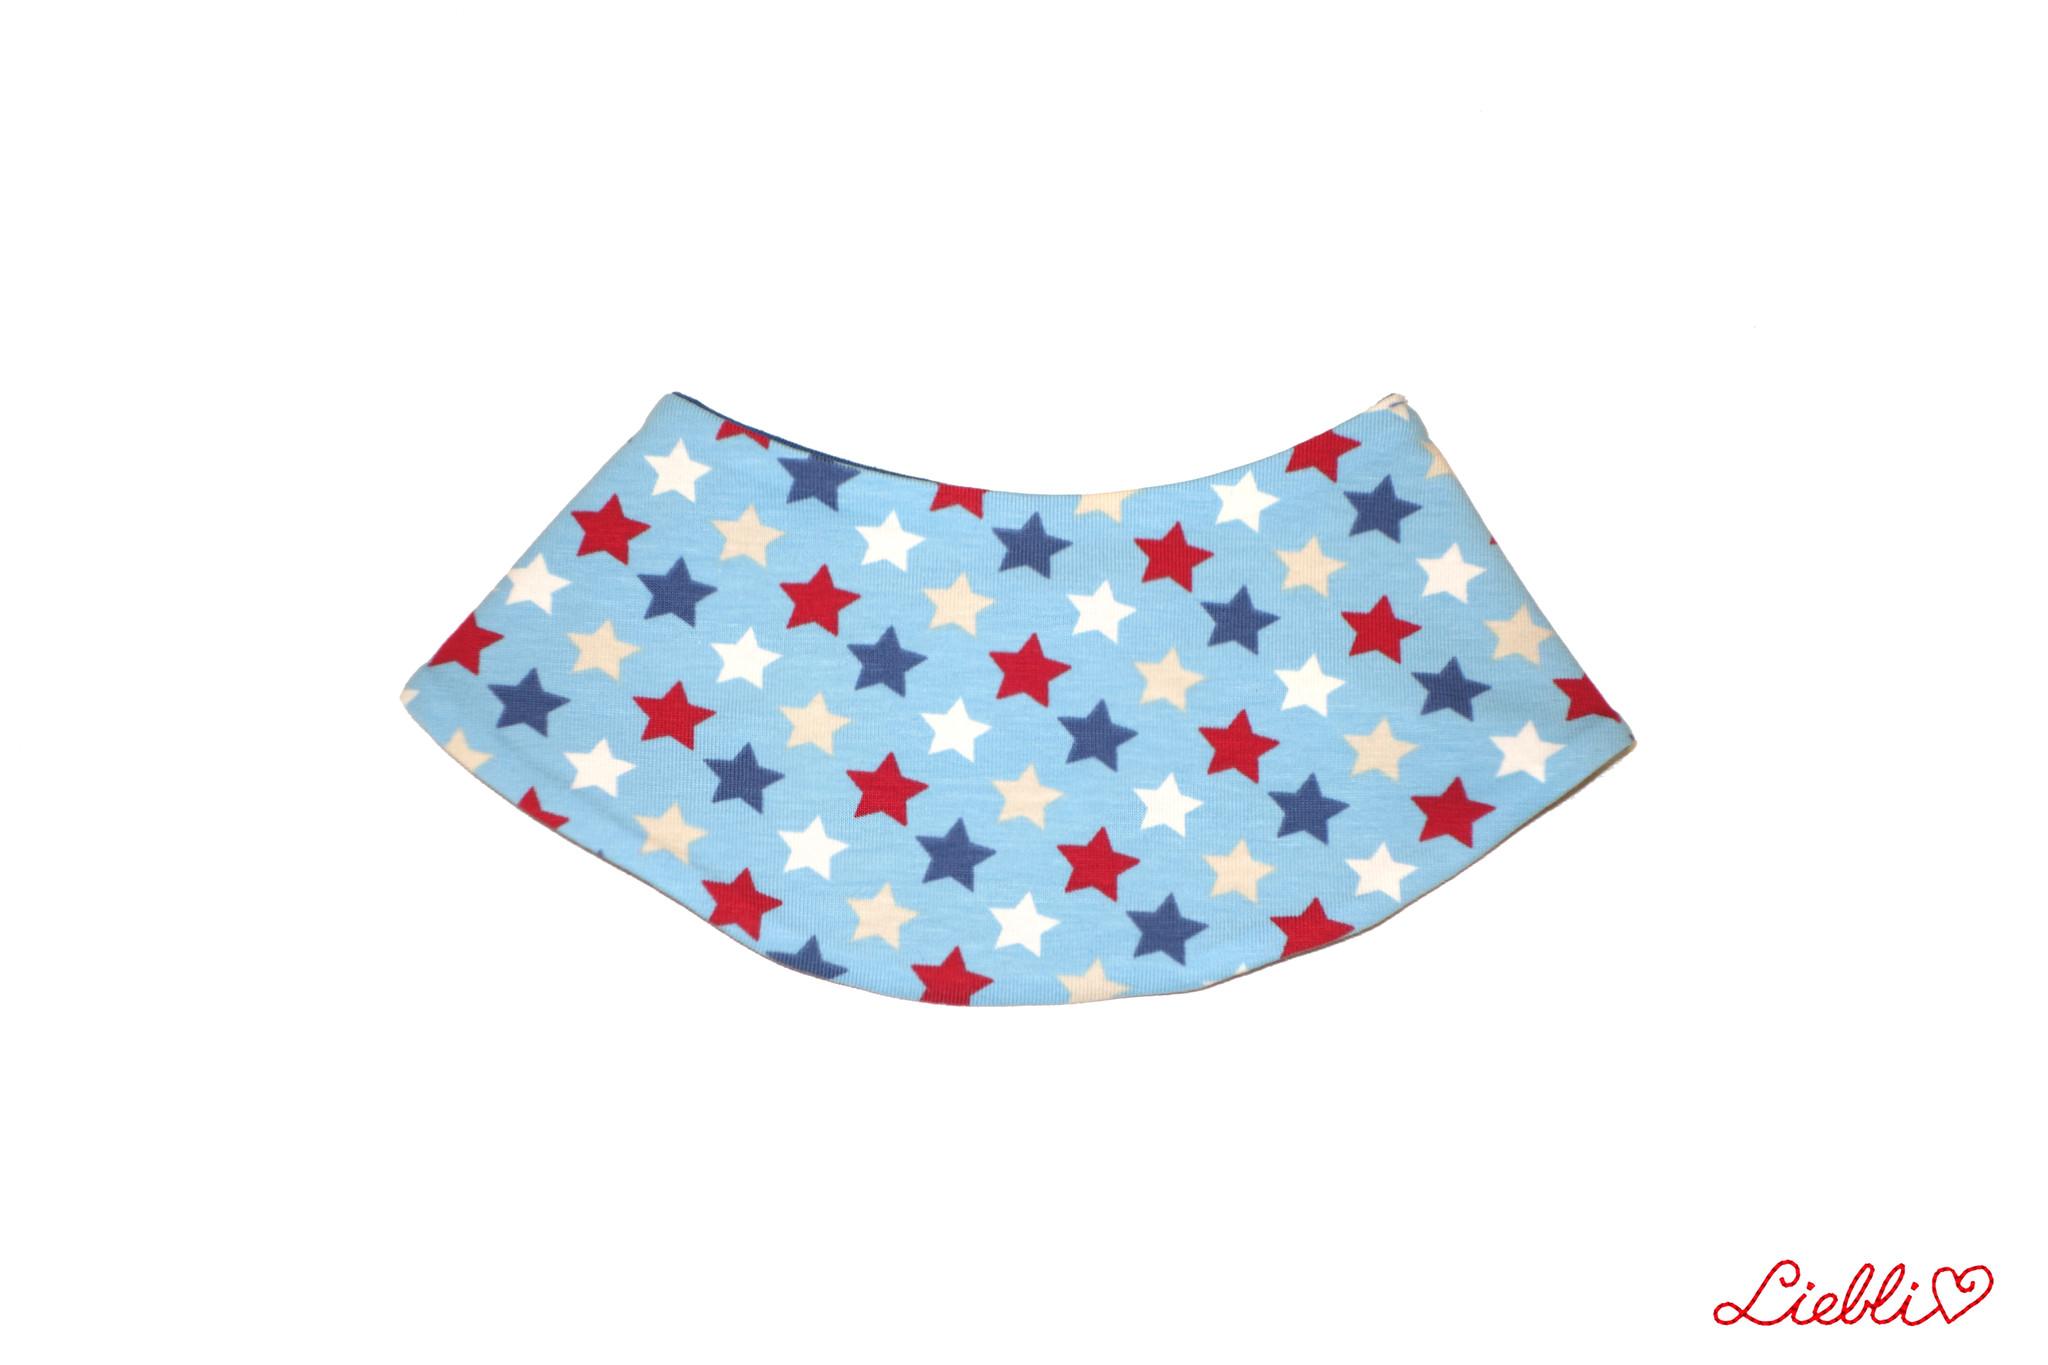 Dreieckstuch Sterne auf hellblau